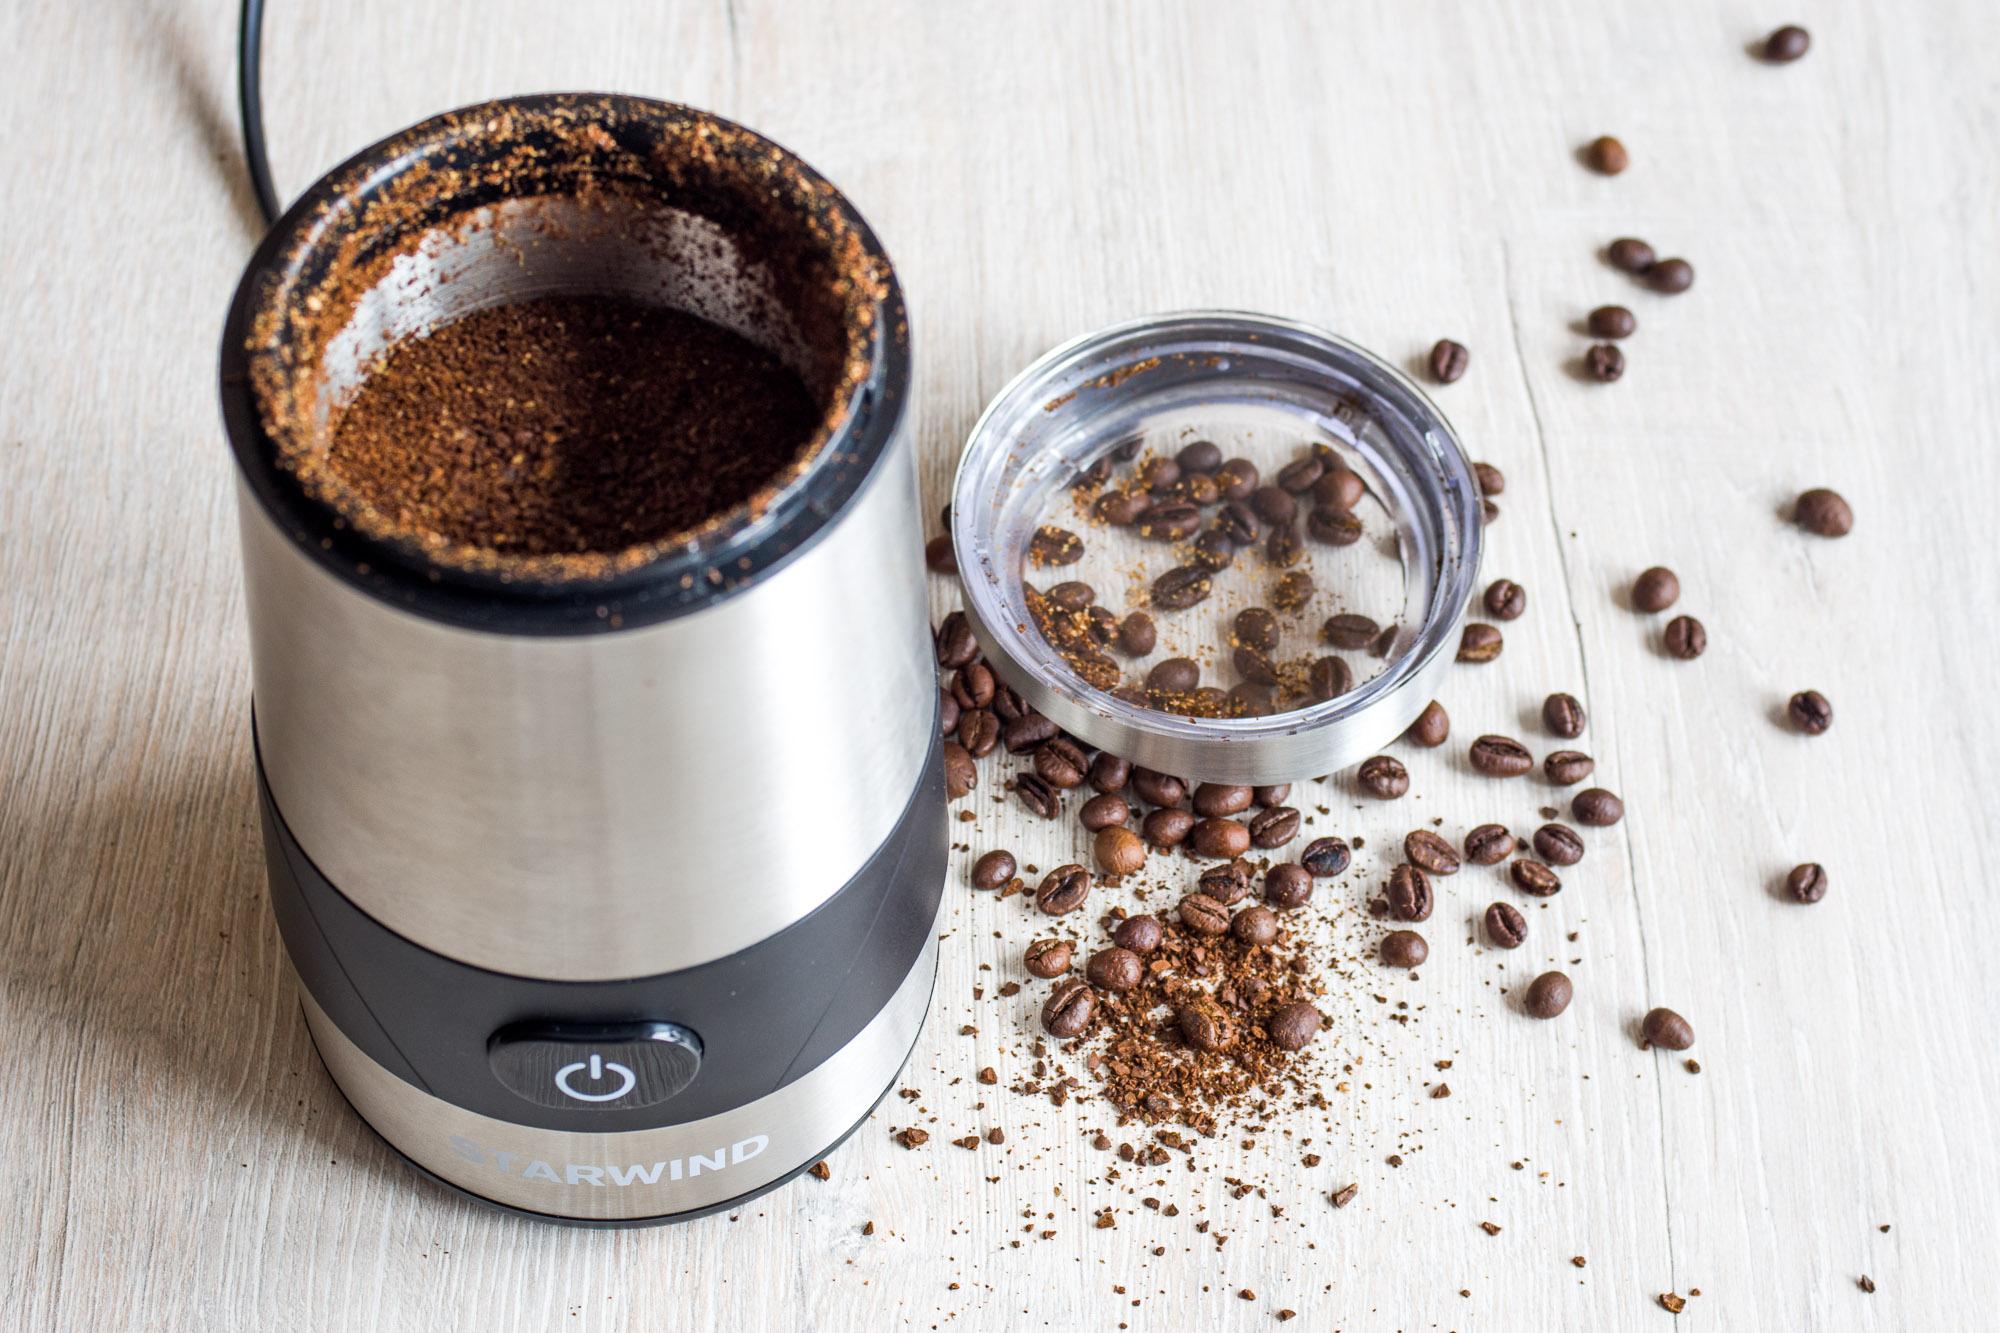 Роторная кофемолка с зернами